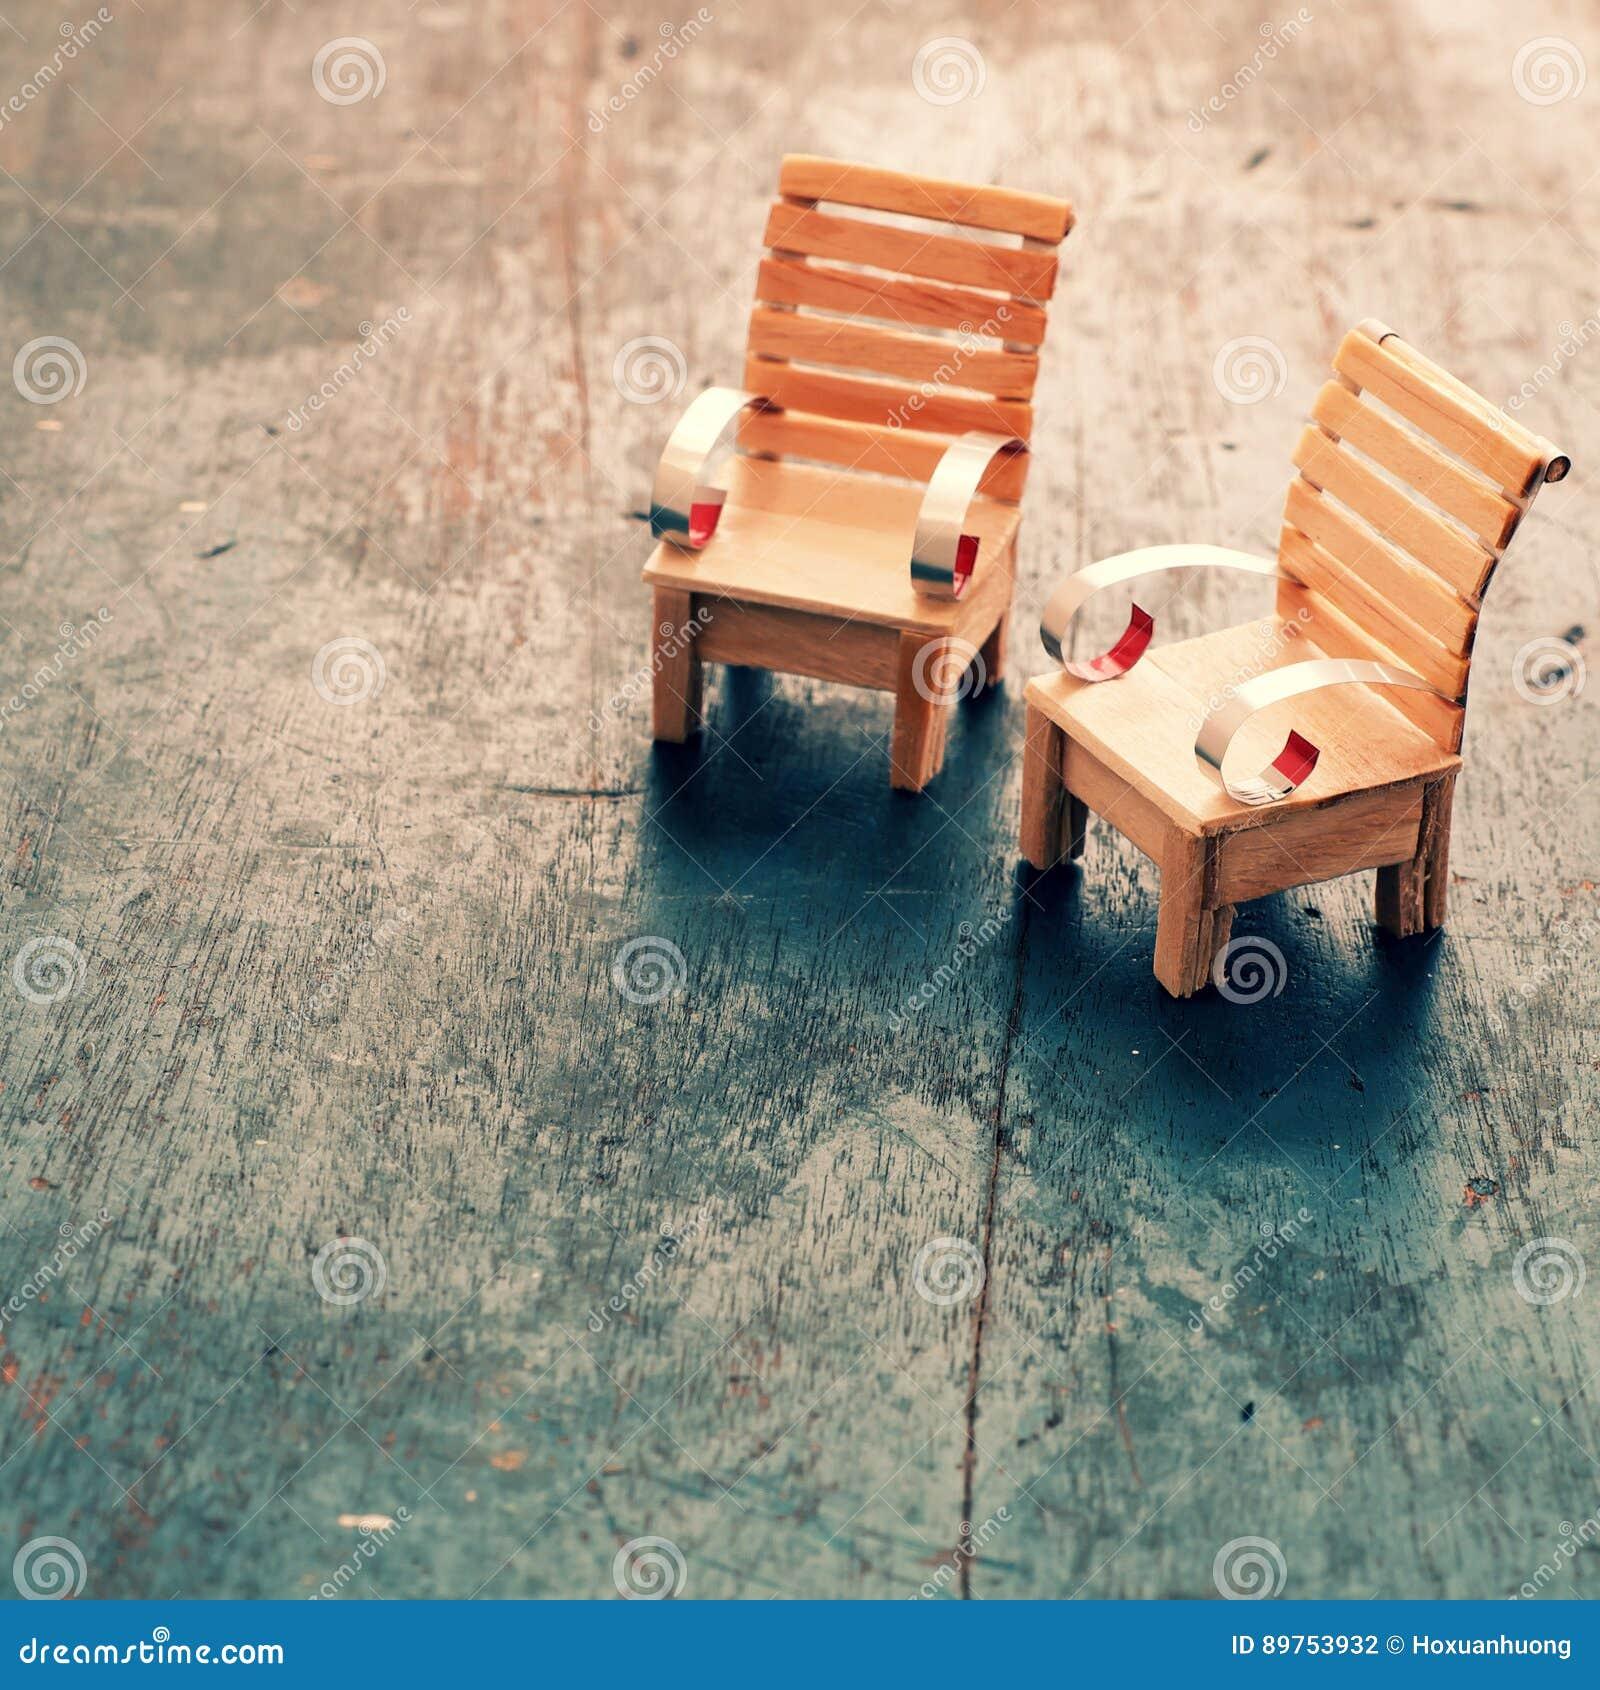 how to make miniature furniture. Download Comp How To Make Miniature Furniture